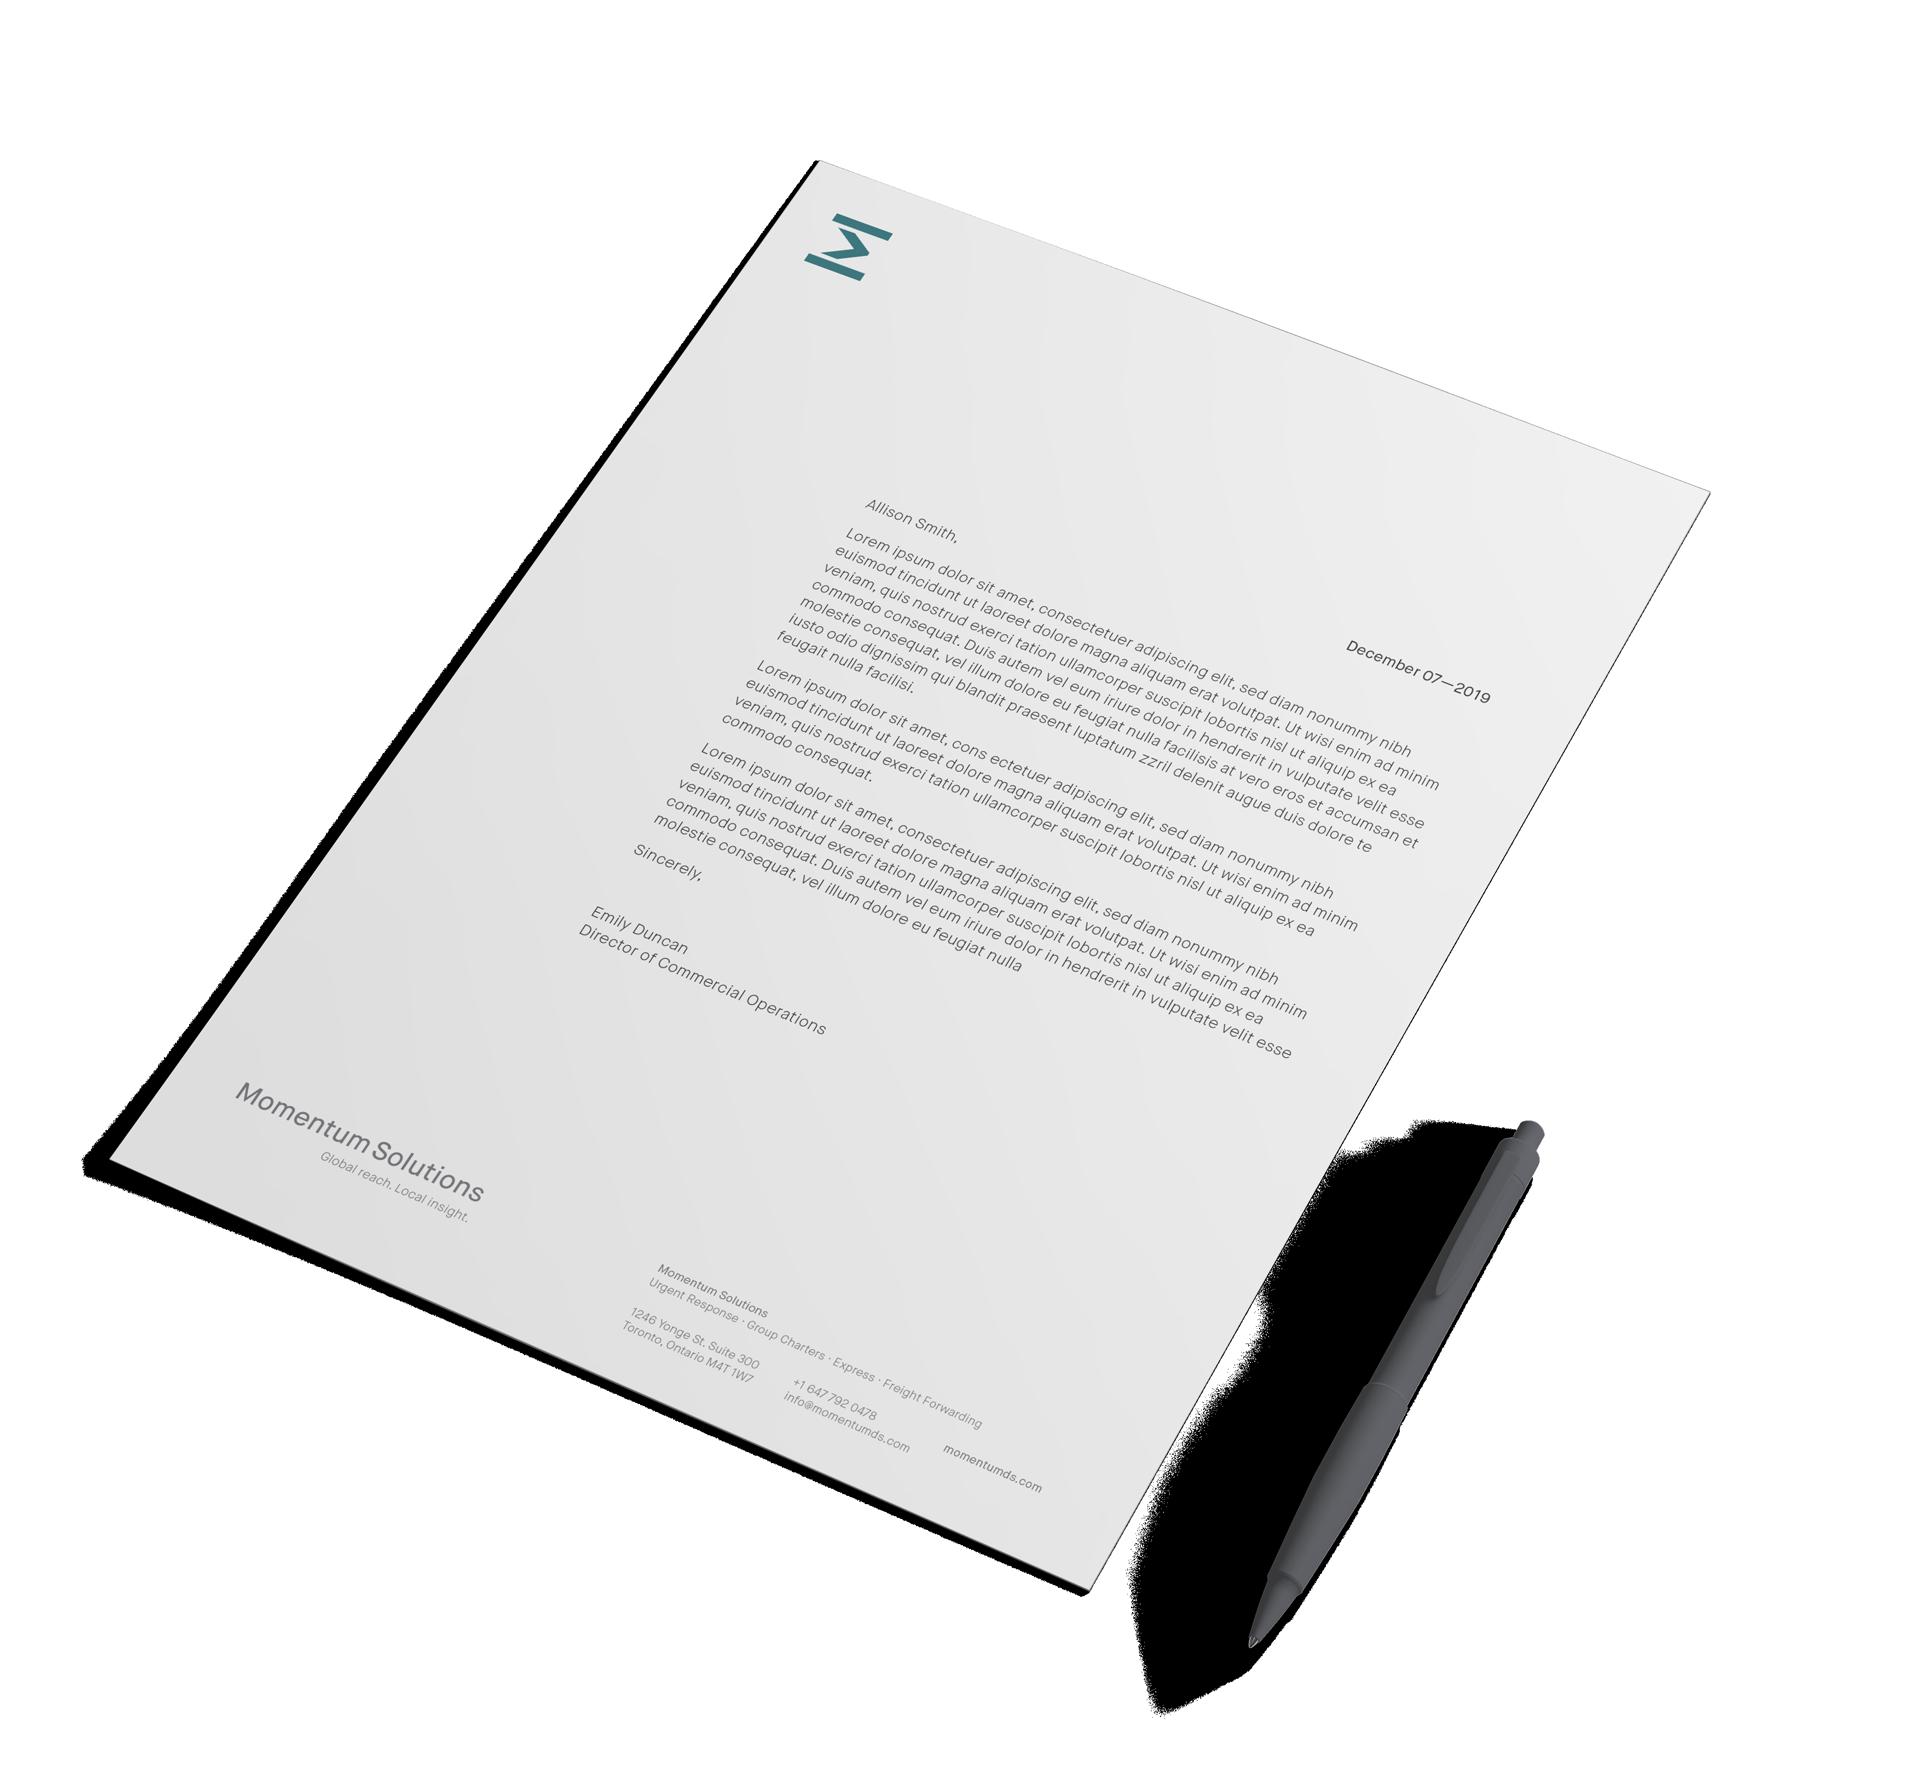 momentum solutions letterhead design